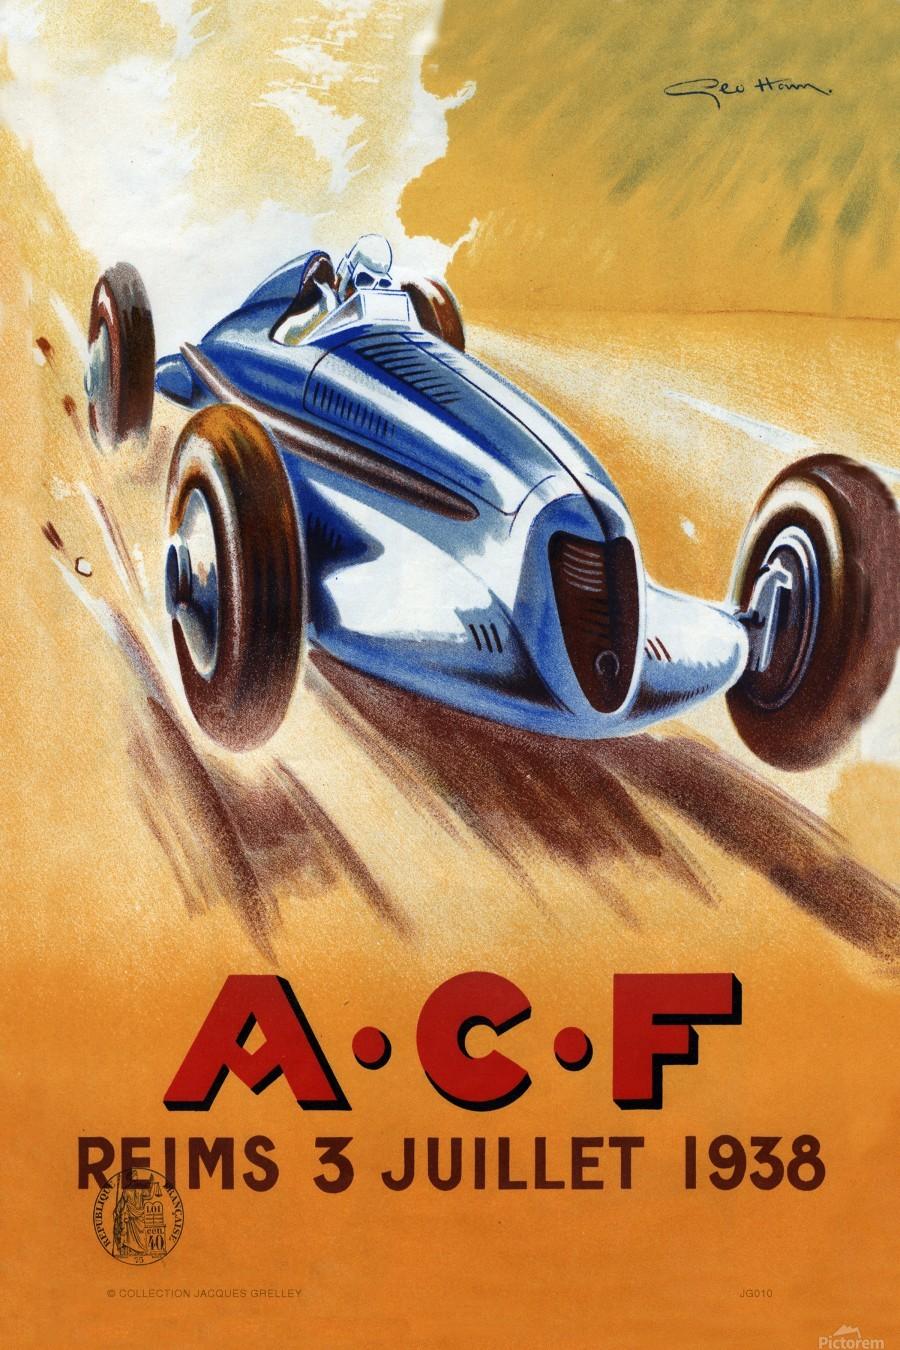 ACF Reims 3 Juillet 1938  Print